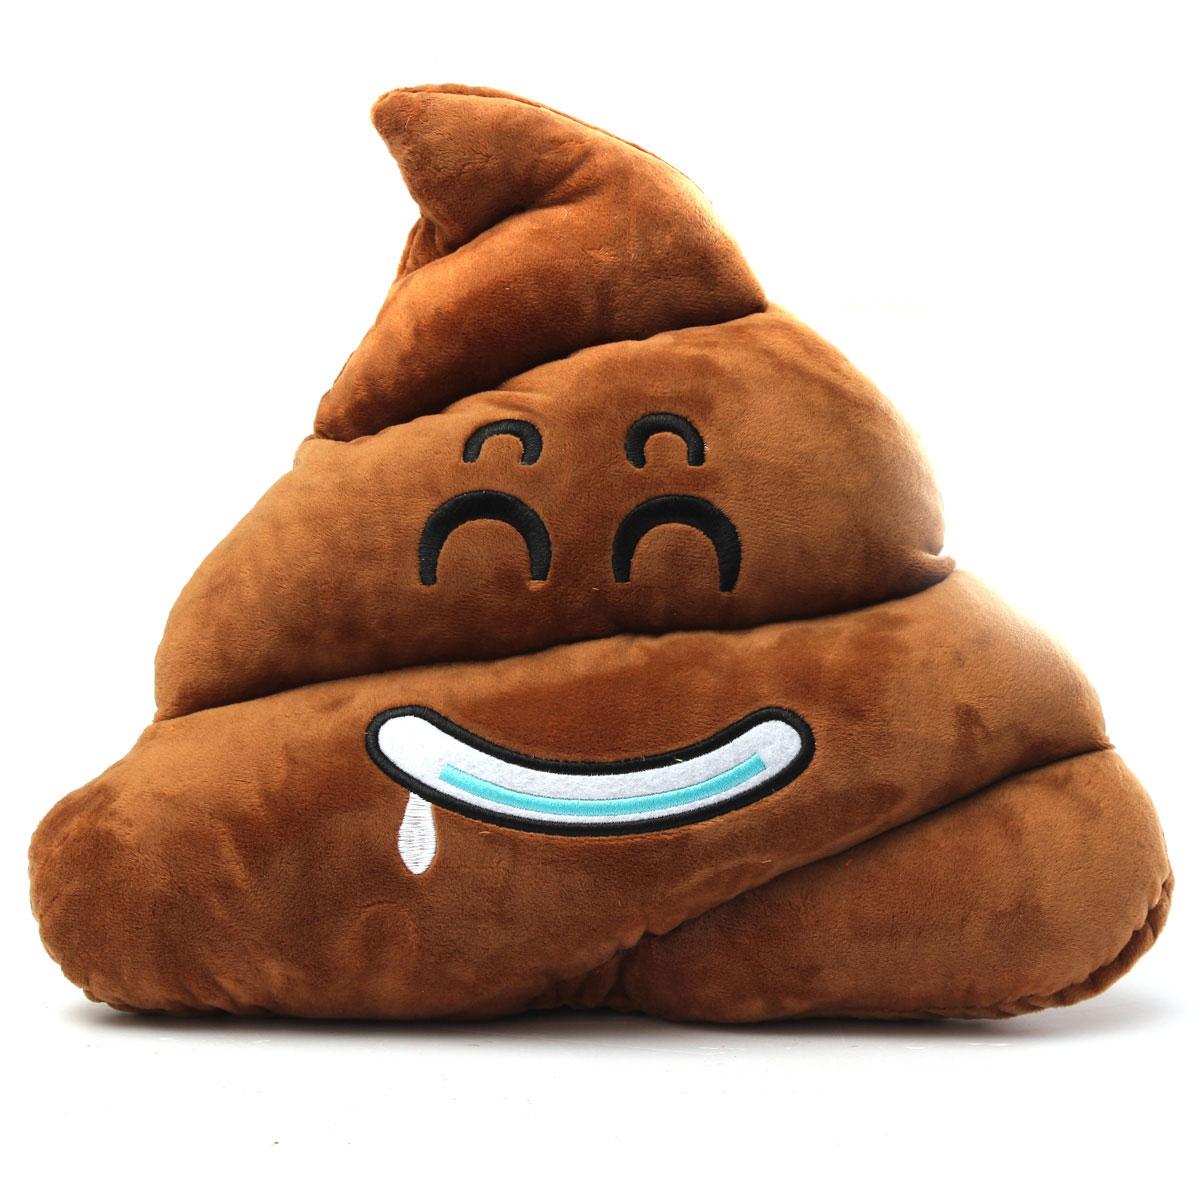 Coussin Oreiller Doux Poo Emoji Emoticones Smiley Peluche Poupee Jouet